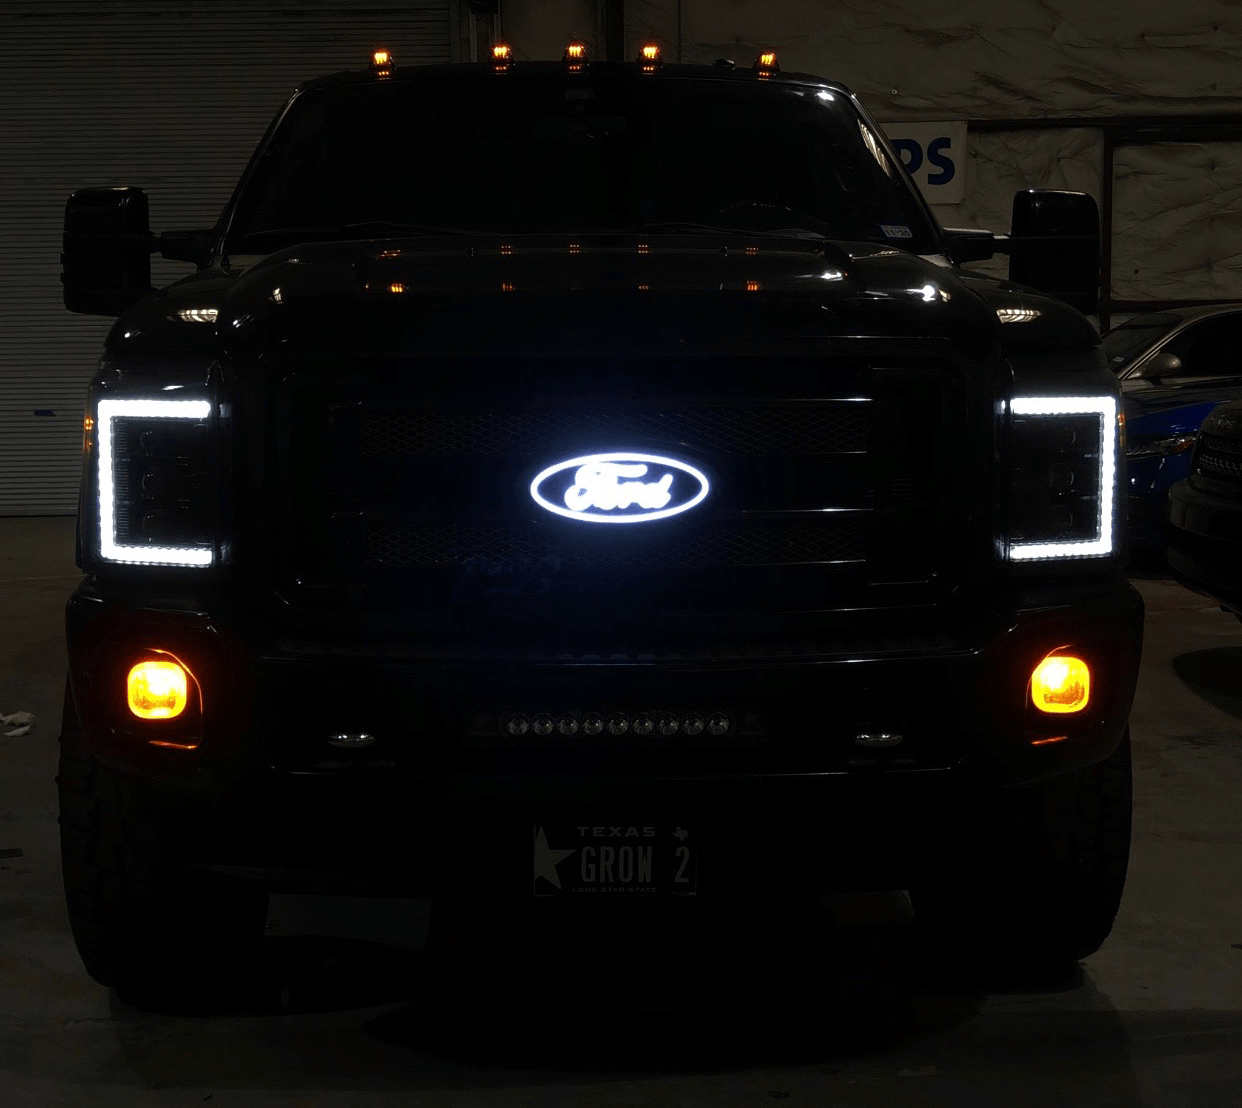 Thf Illuminated Led Emblem 11 16 Ford Super Duty F 250 F 350 The Hid Factory